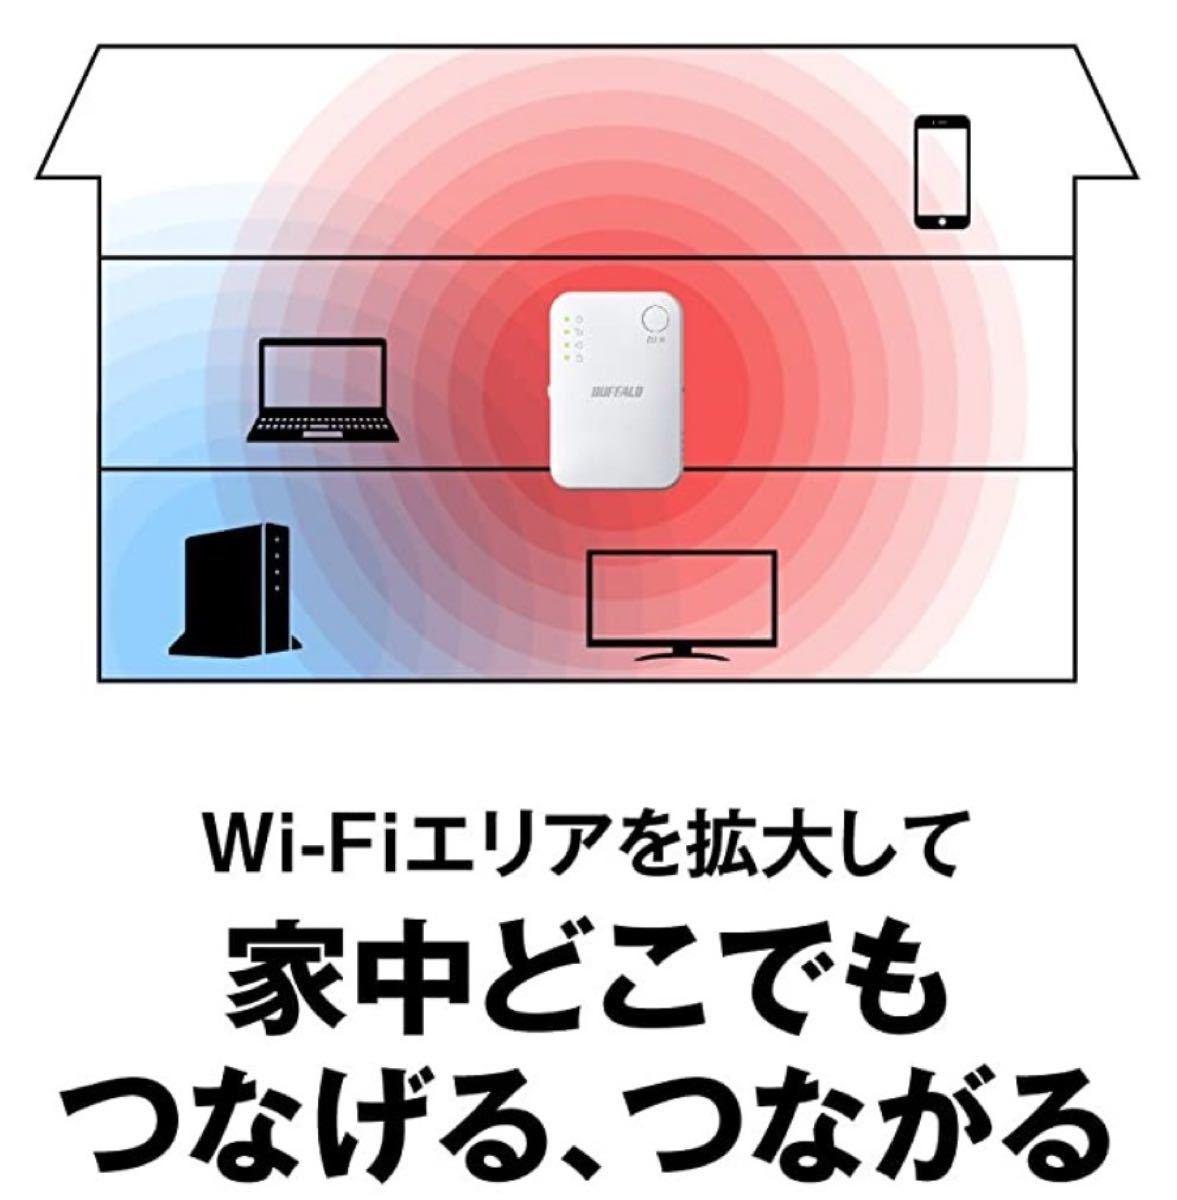 WiFiエリア拡大【美品・30日保証】コンセント直挿しタイプの無線LAN中継機ハイパワーコンパクト★WEX-1166DHPS